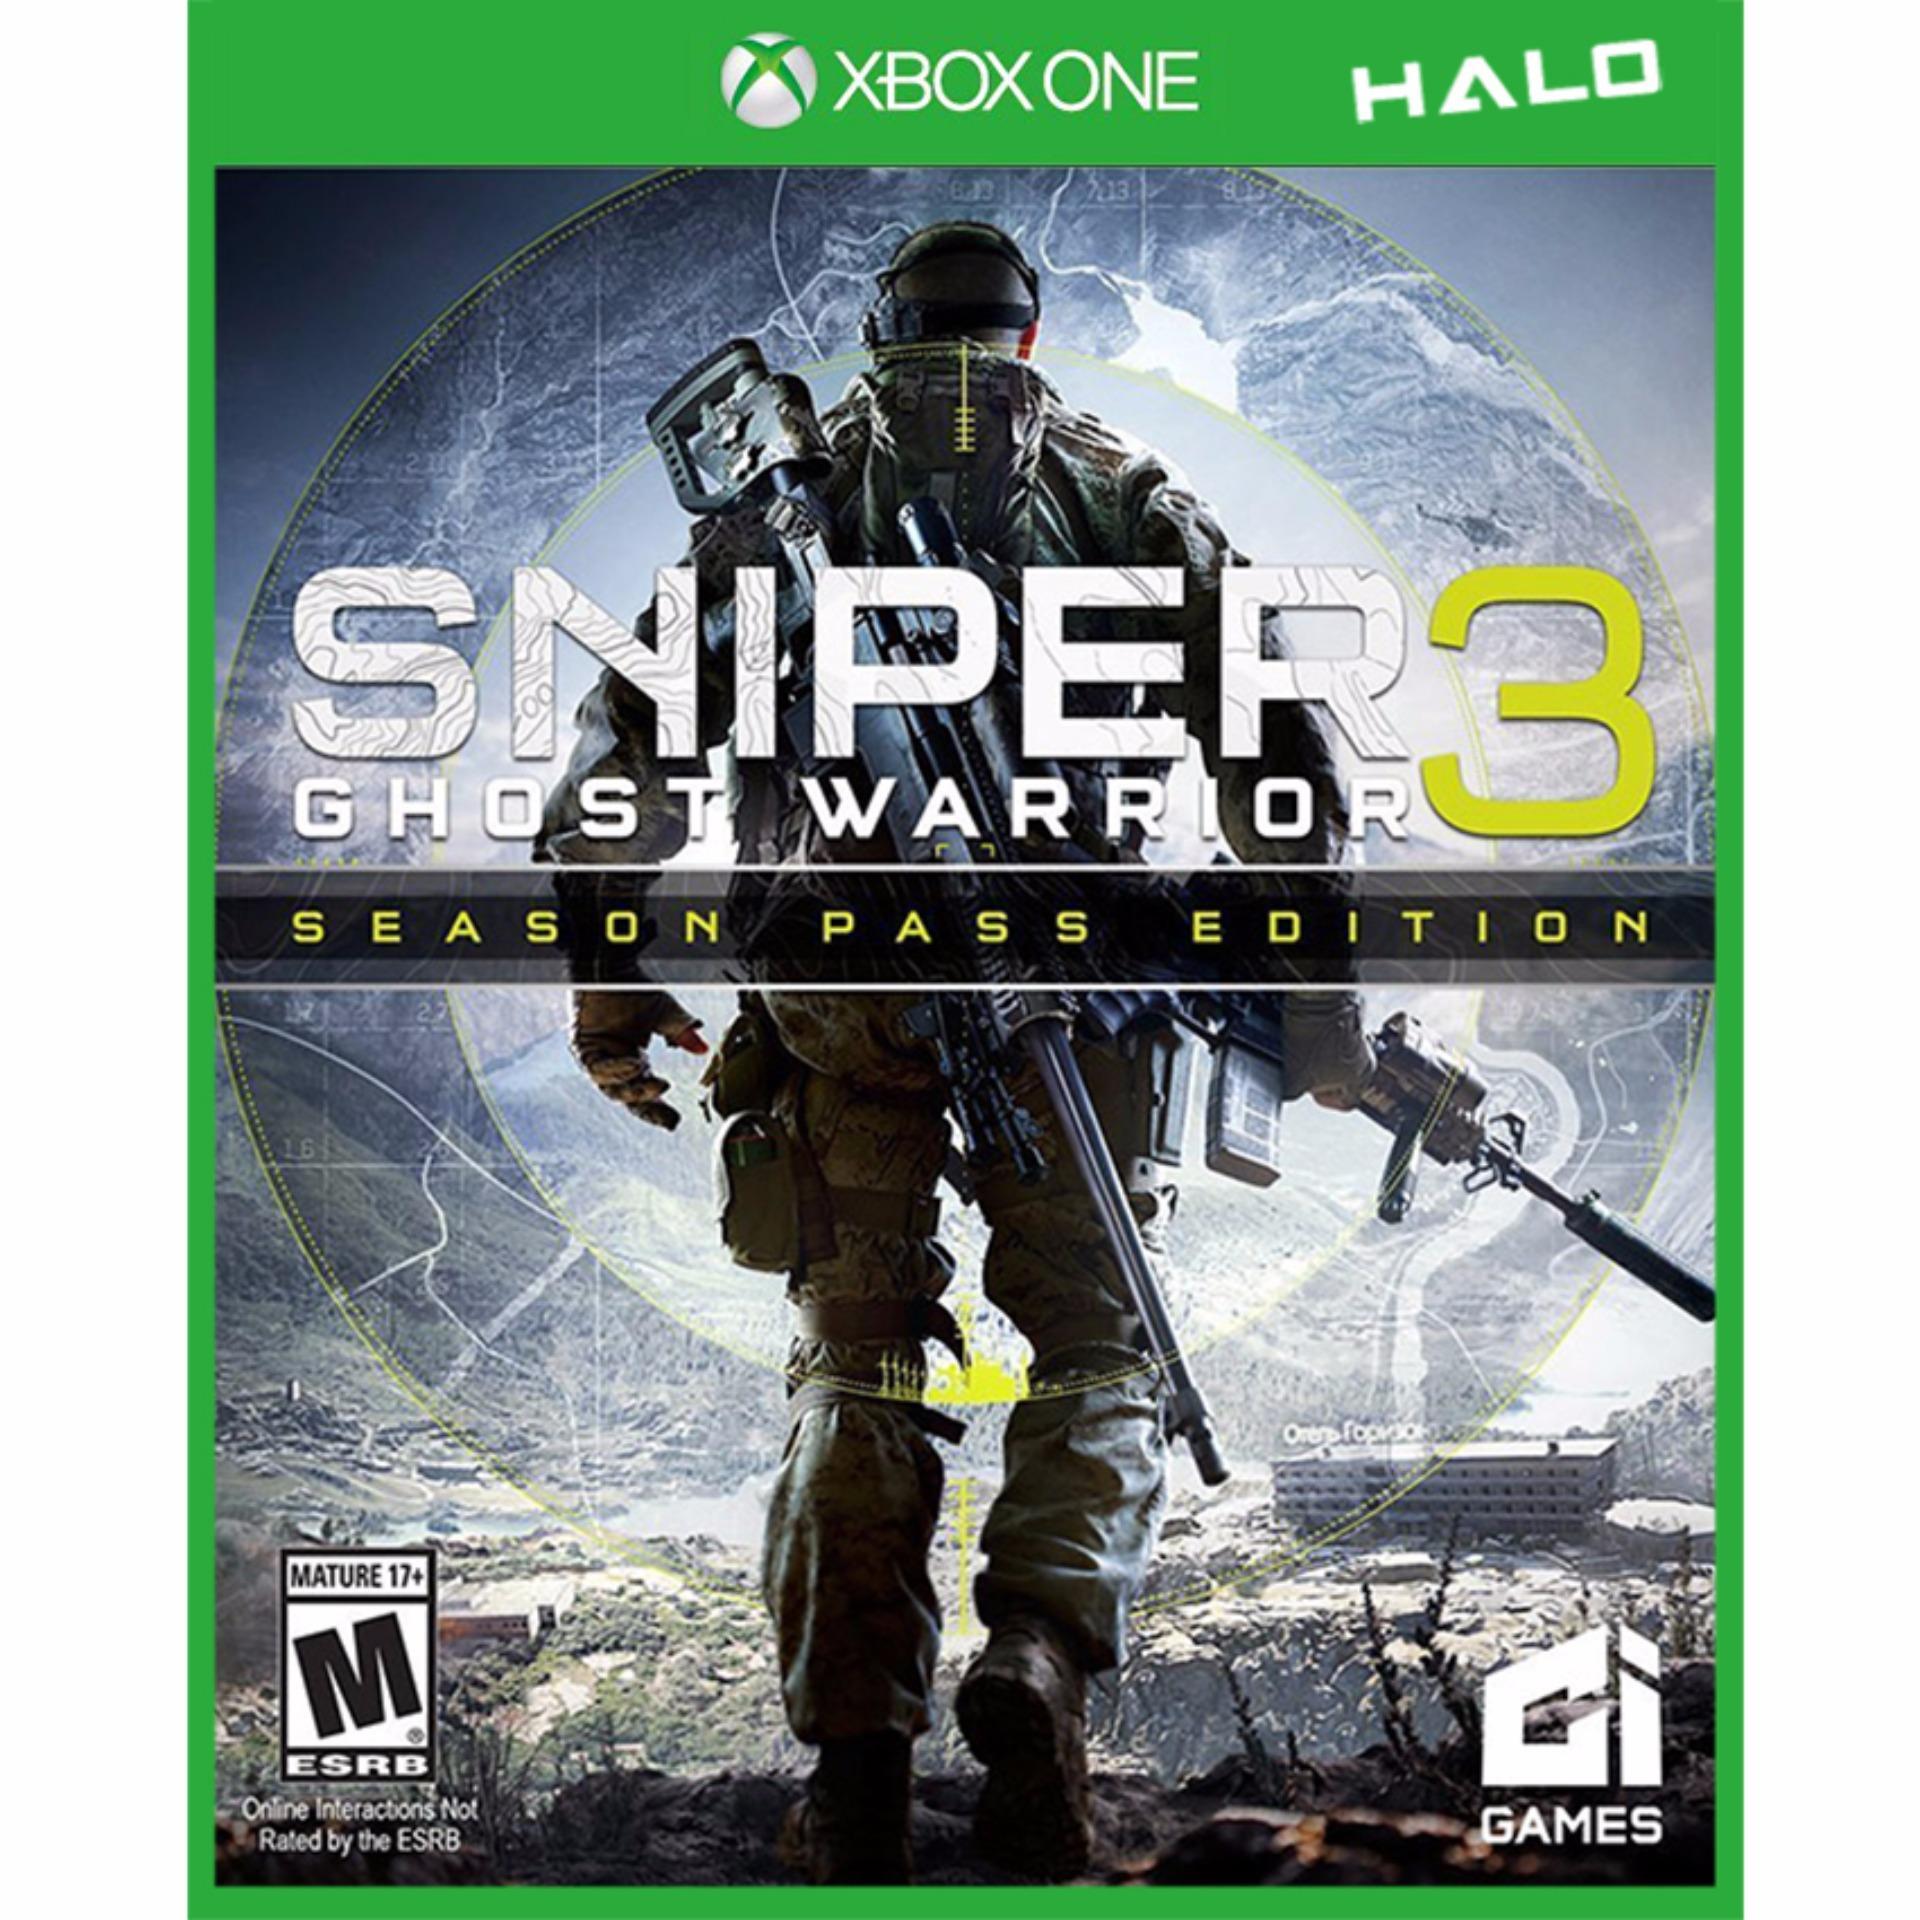 Báo Giá Đĩa Game Xbox One Sniper Ghost Warrior 3